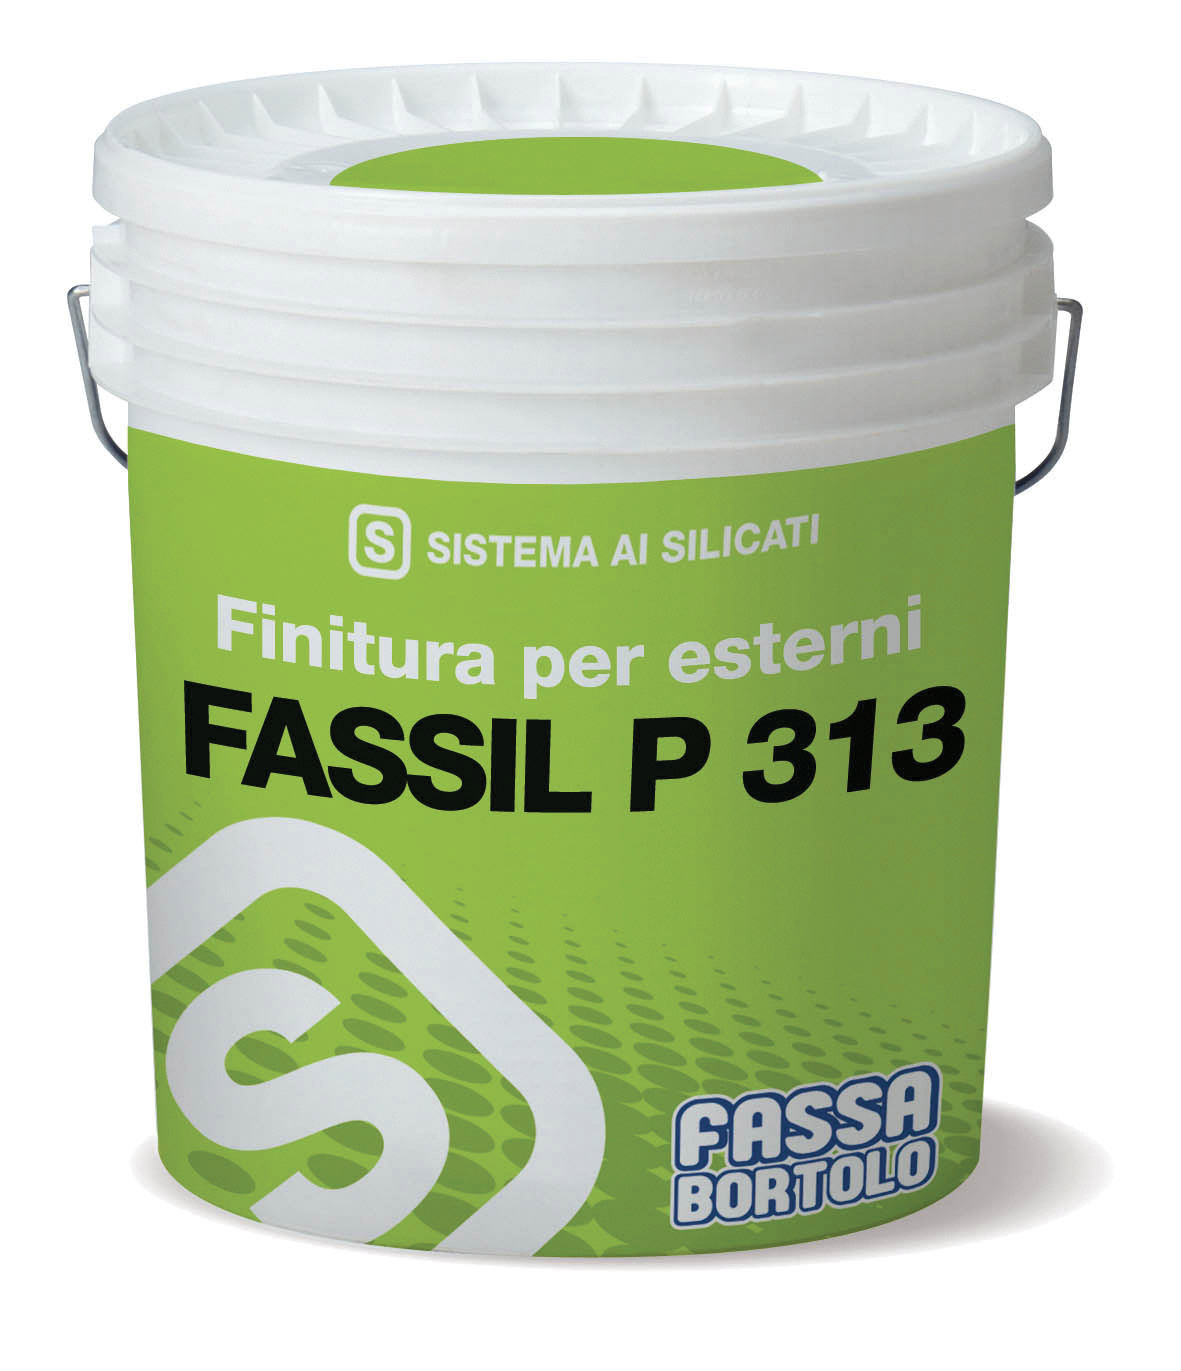 FASSIL P 313: Idropittura minerale ai silicati liscia